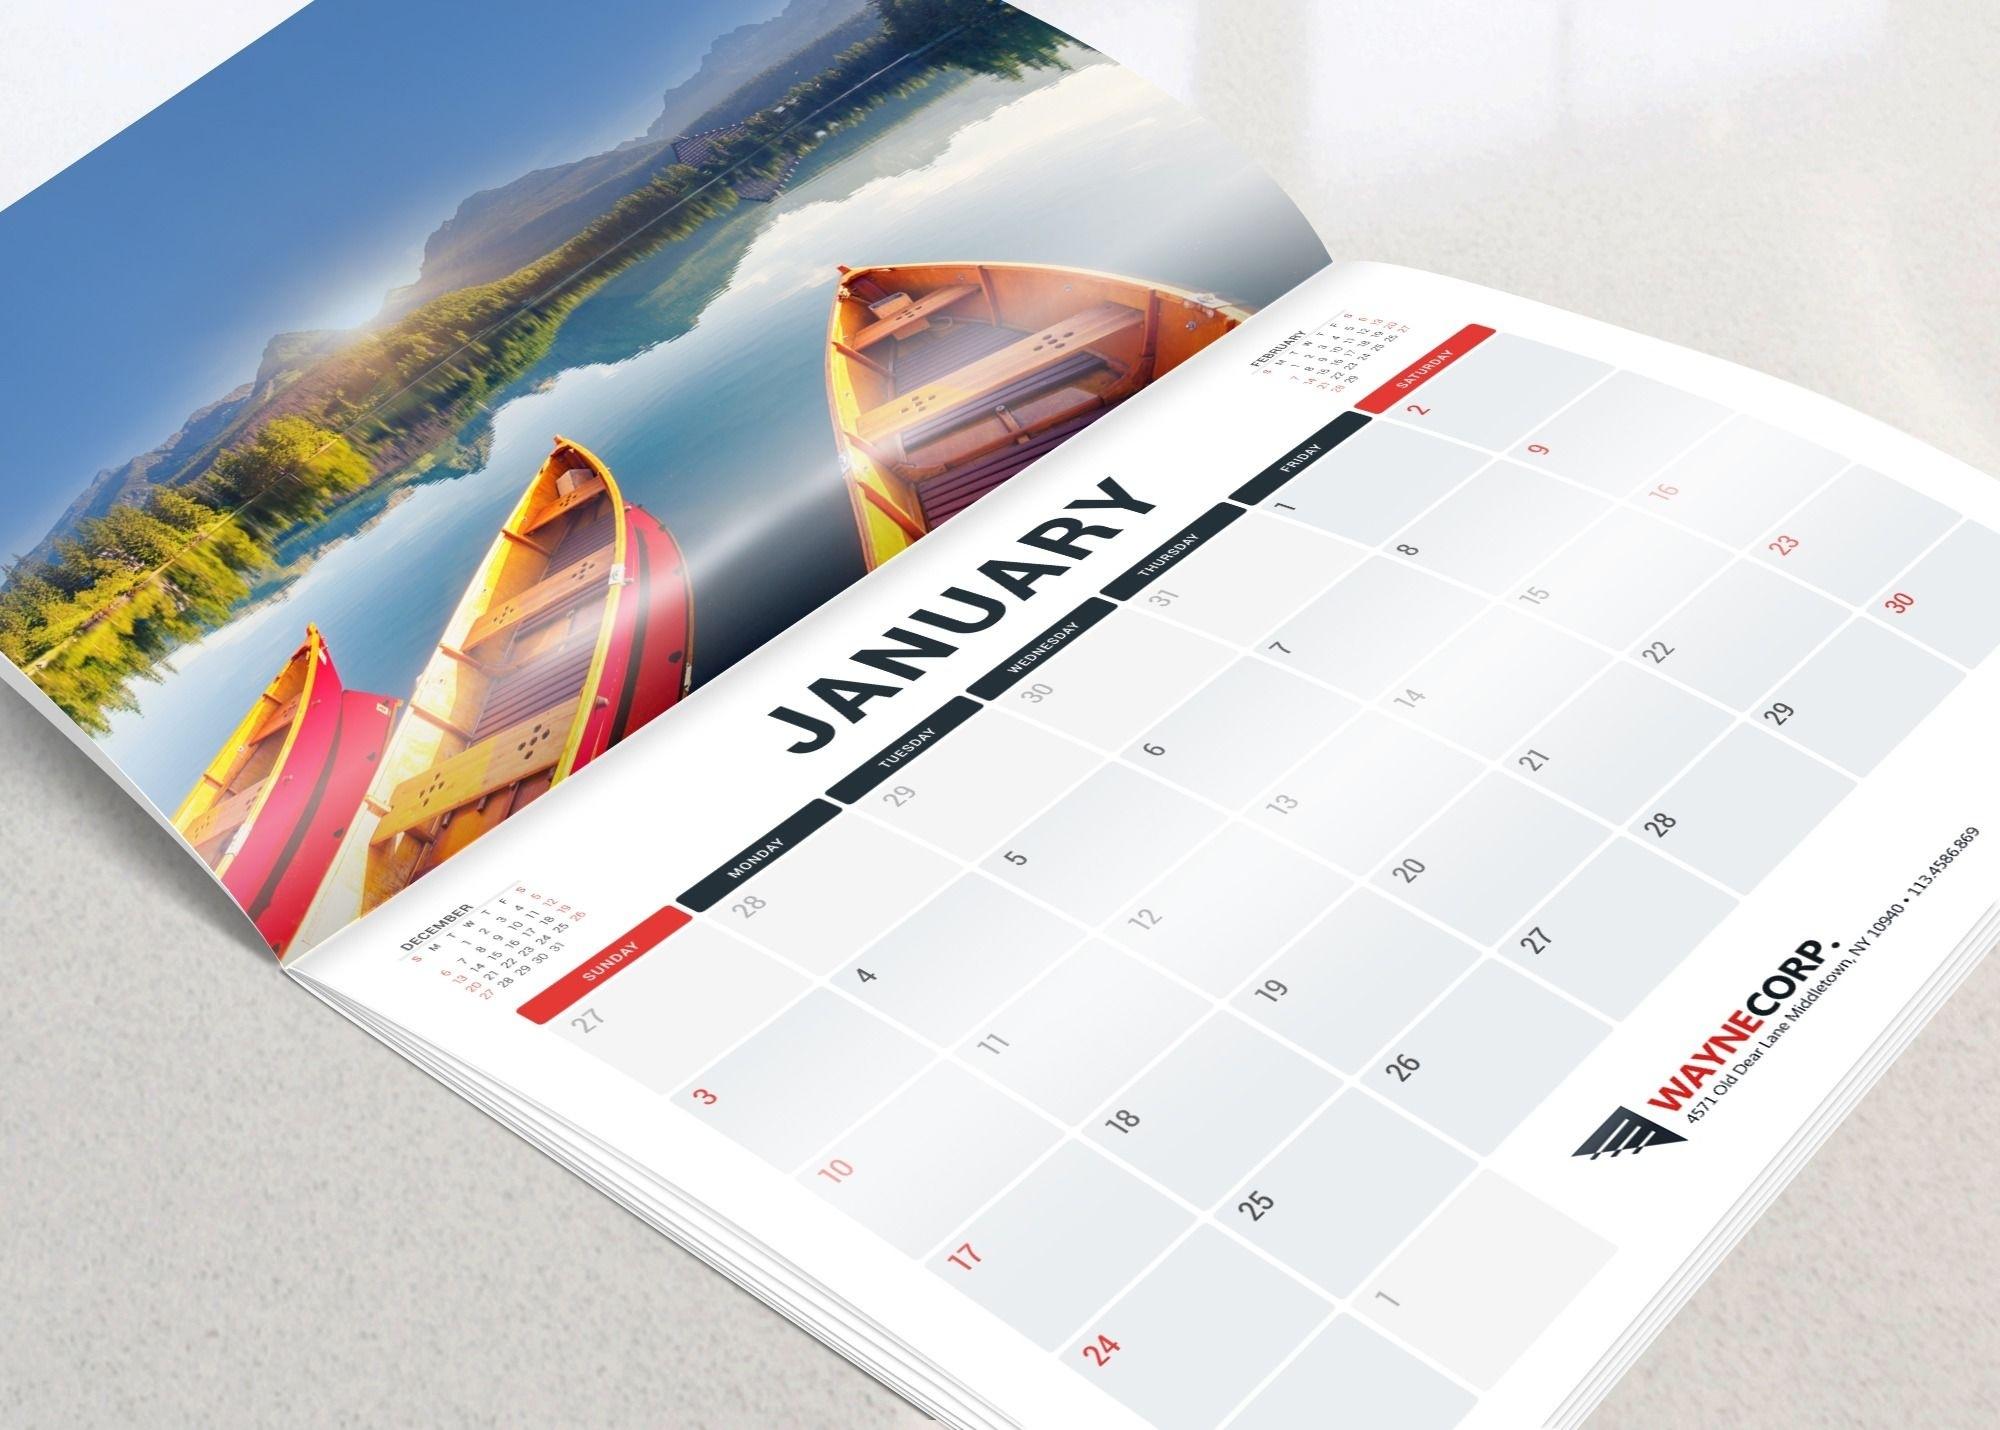 Calendar Printing | Sameday Printing, Sameday Flyers, Election_Calendar Printing In Zimbabwe